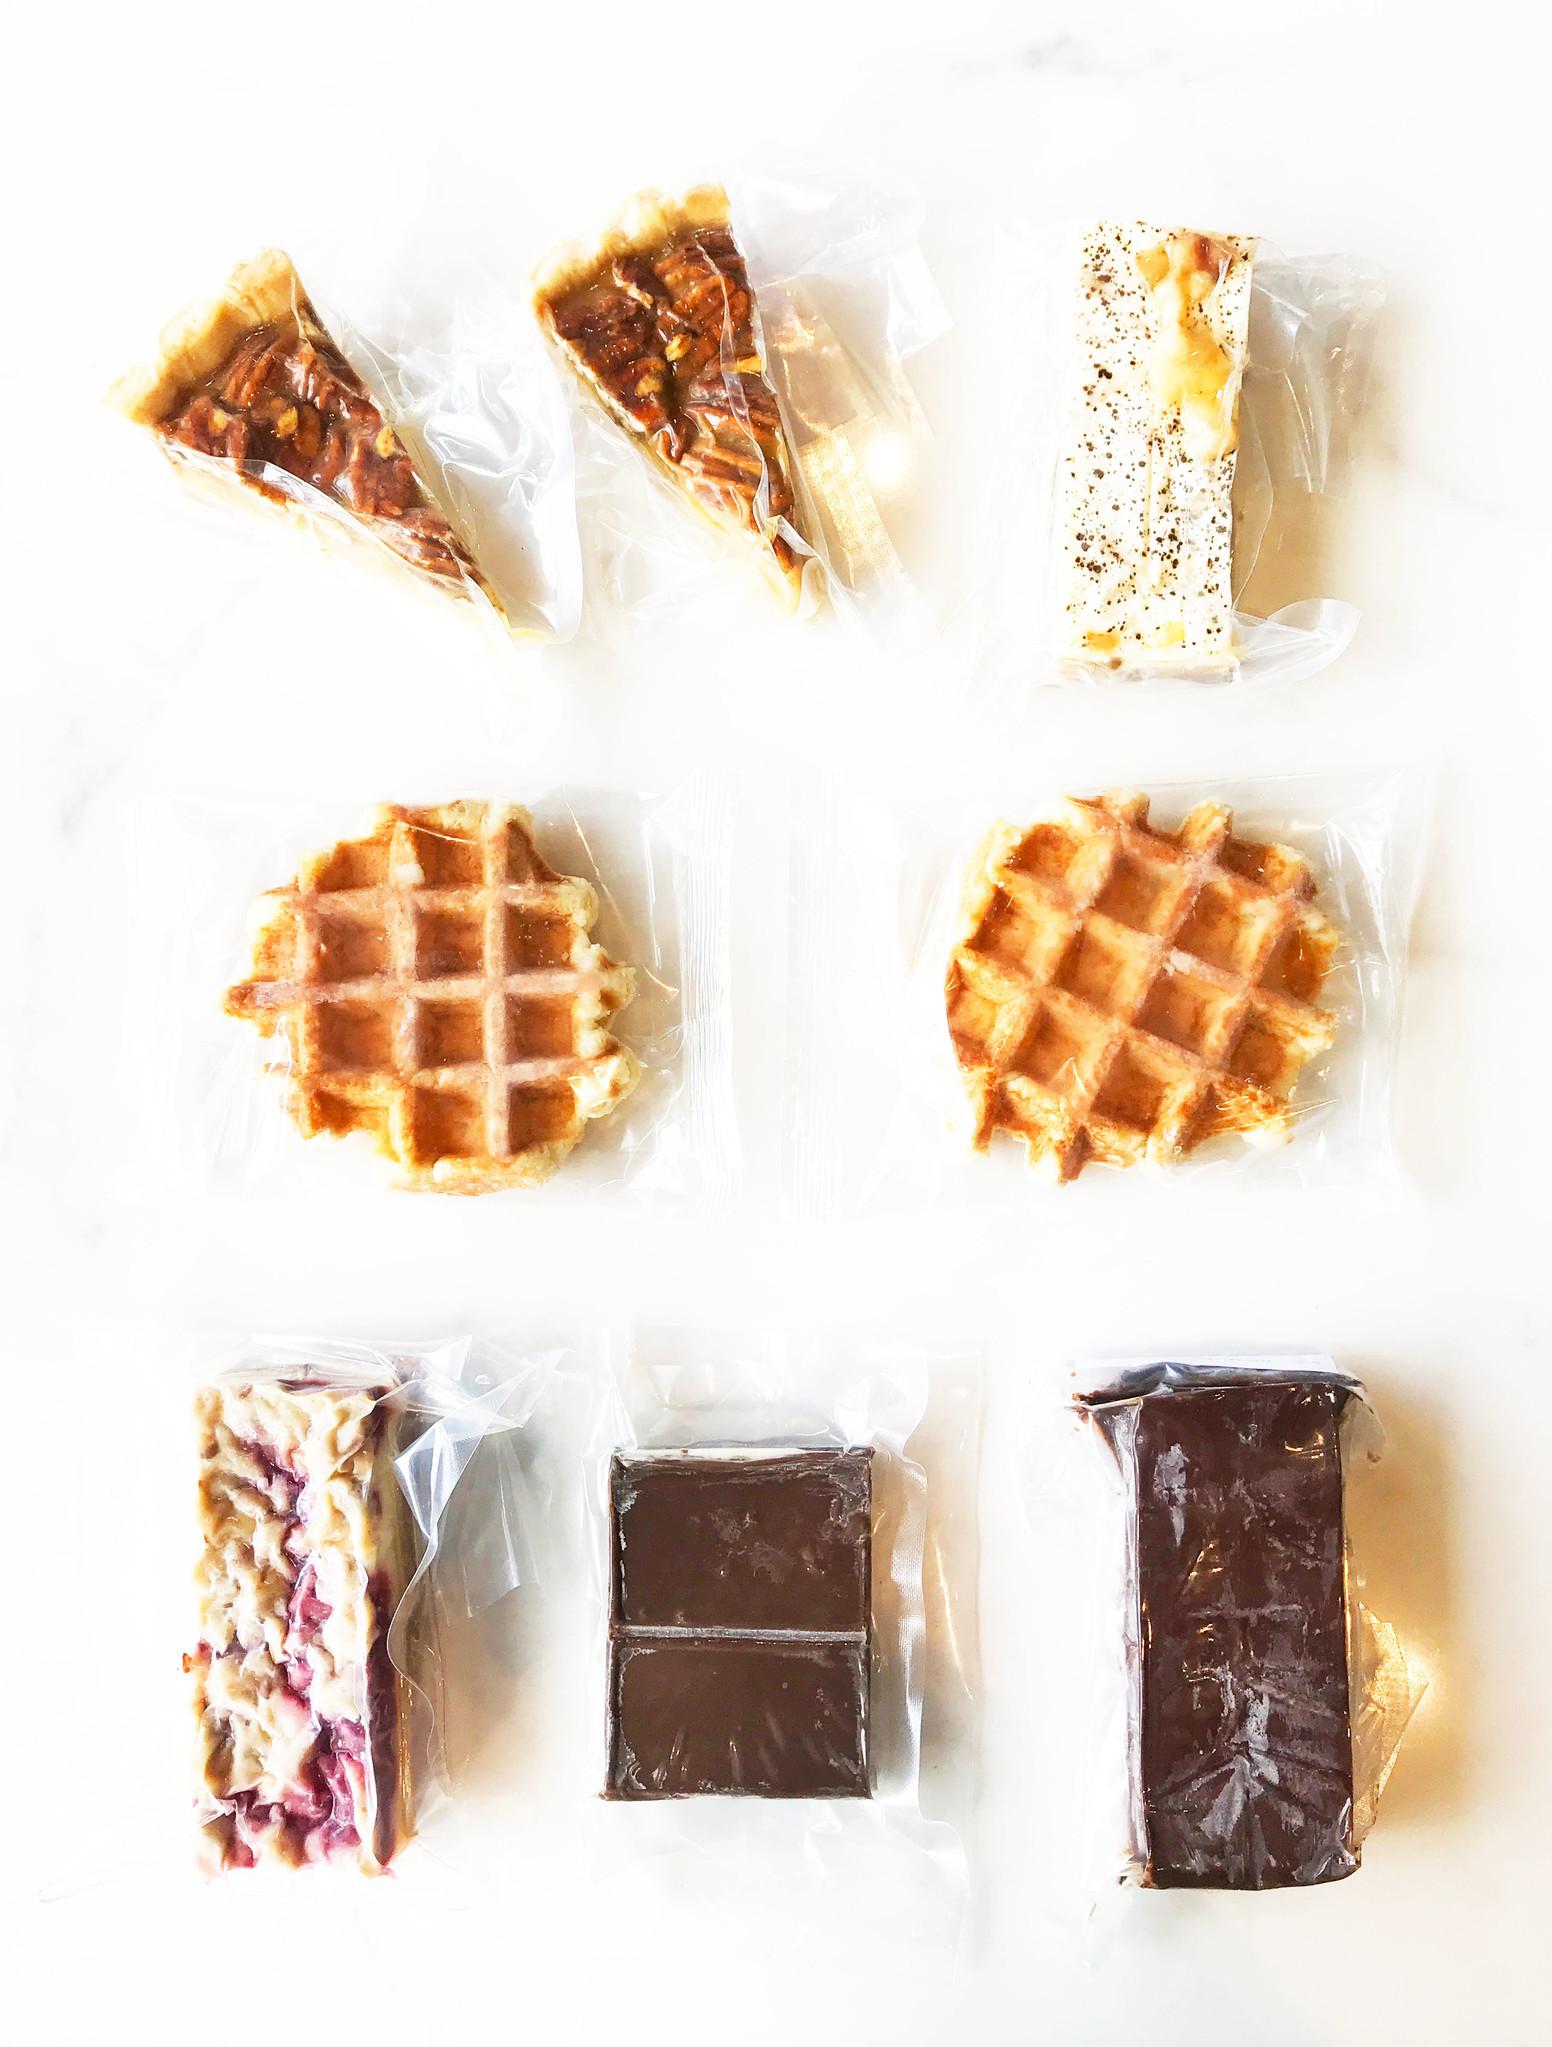 Grande boîte de desserts